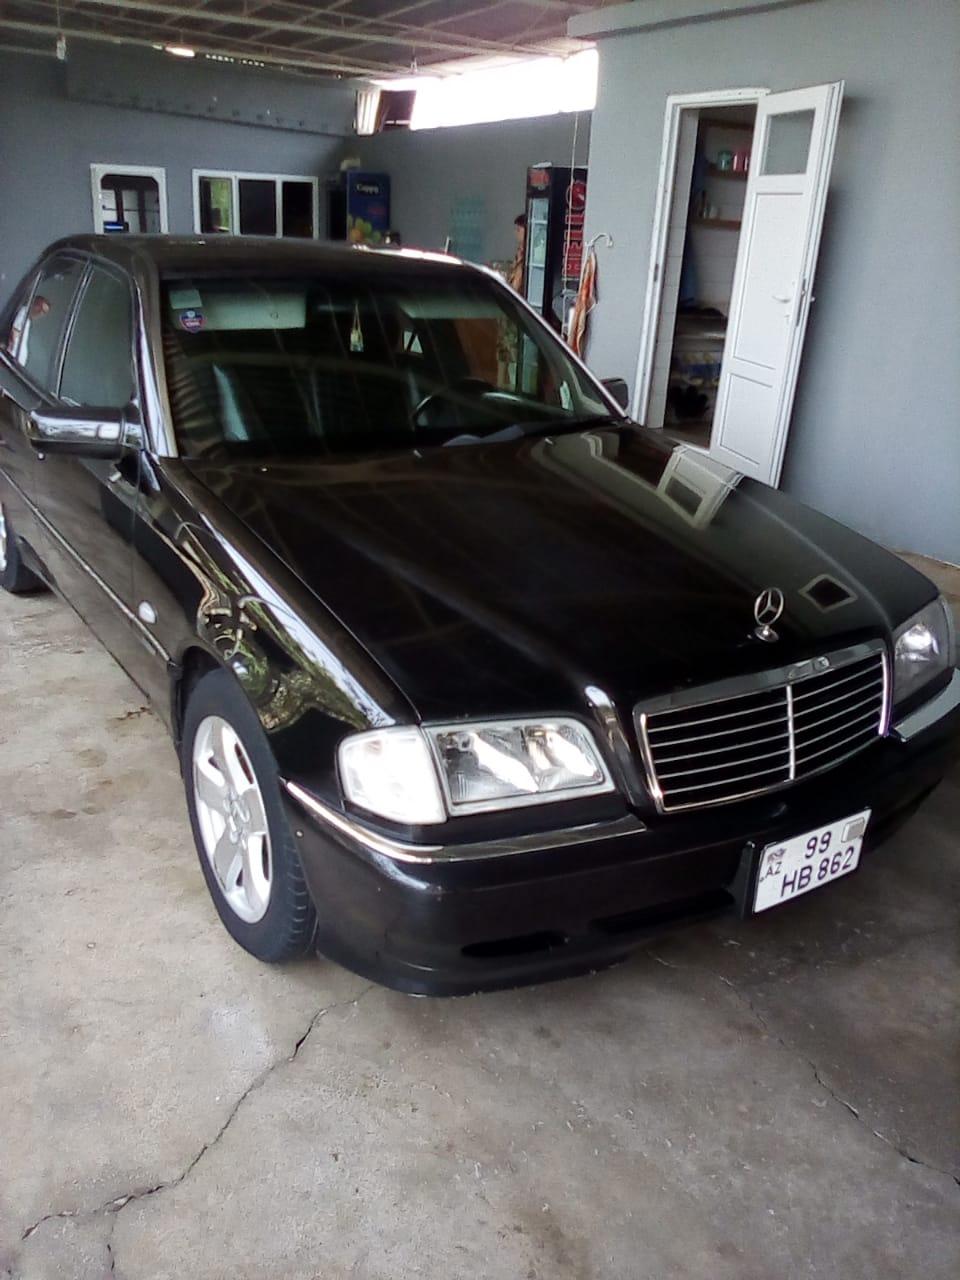 Mercedes-Benz C 240 2.4(lt) 1999 İkinci əl  $16000